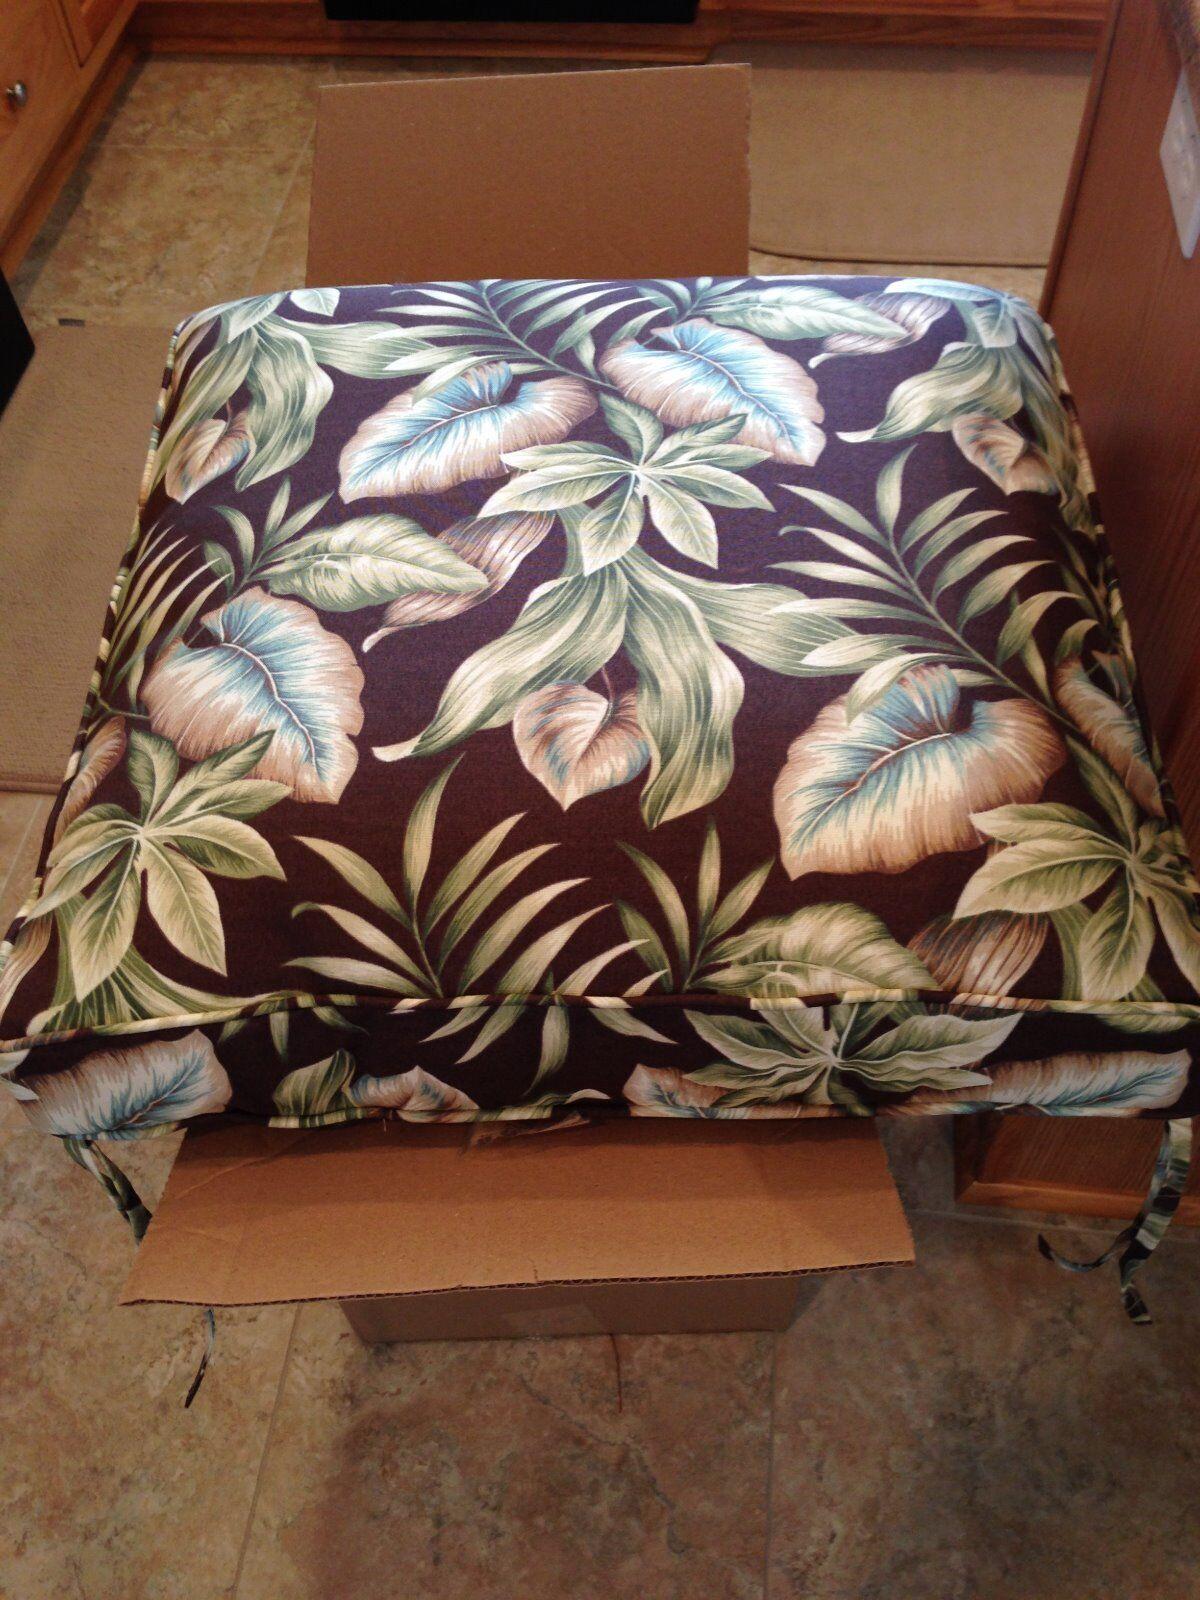 Acrylic Patio Seat Cushions (5) - 23  x 23  x 4   - Floral Multi-Farbe